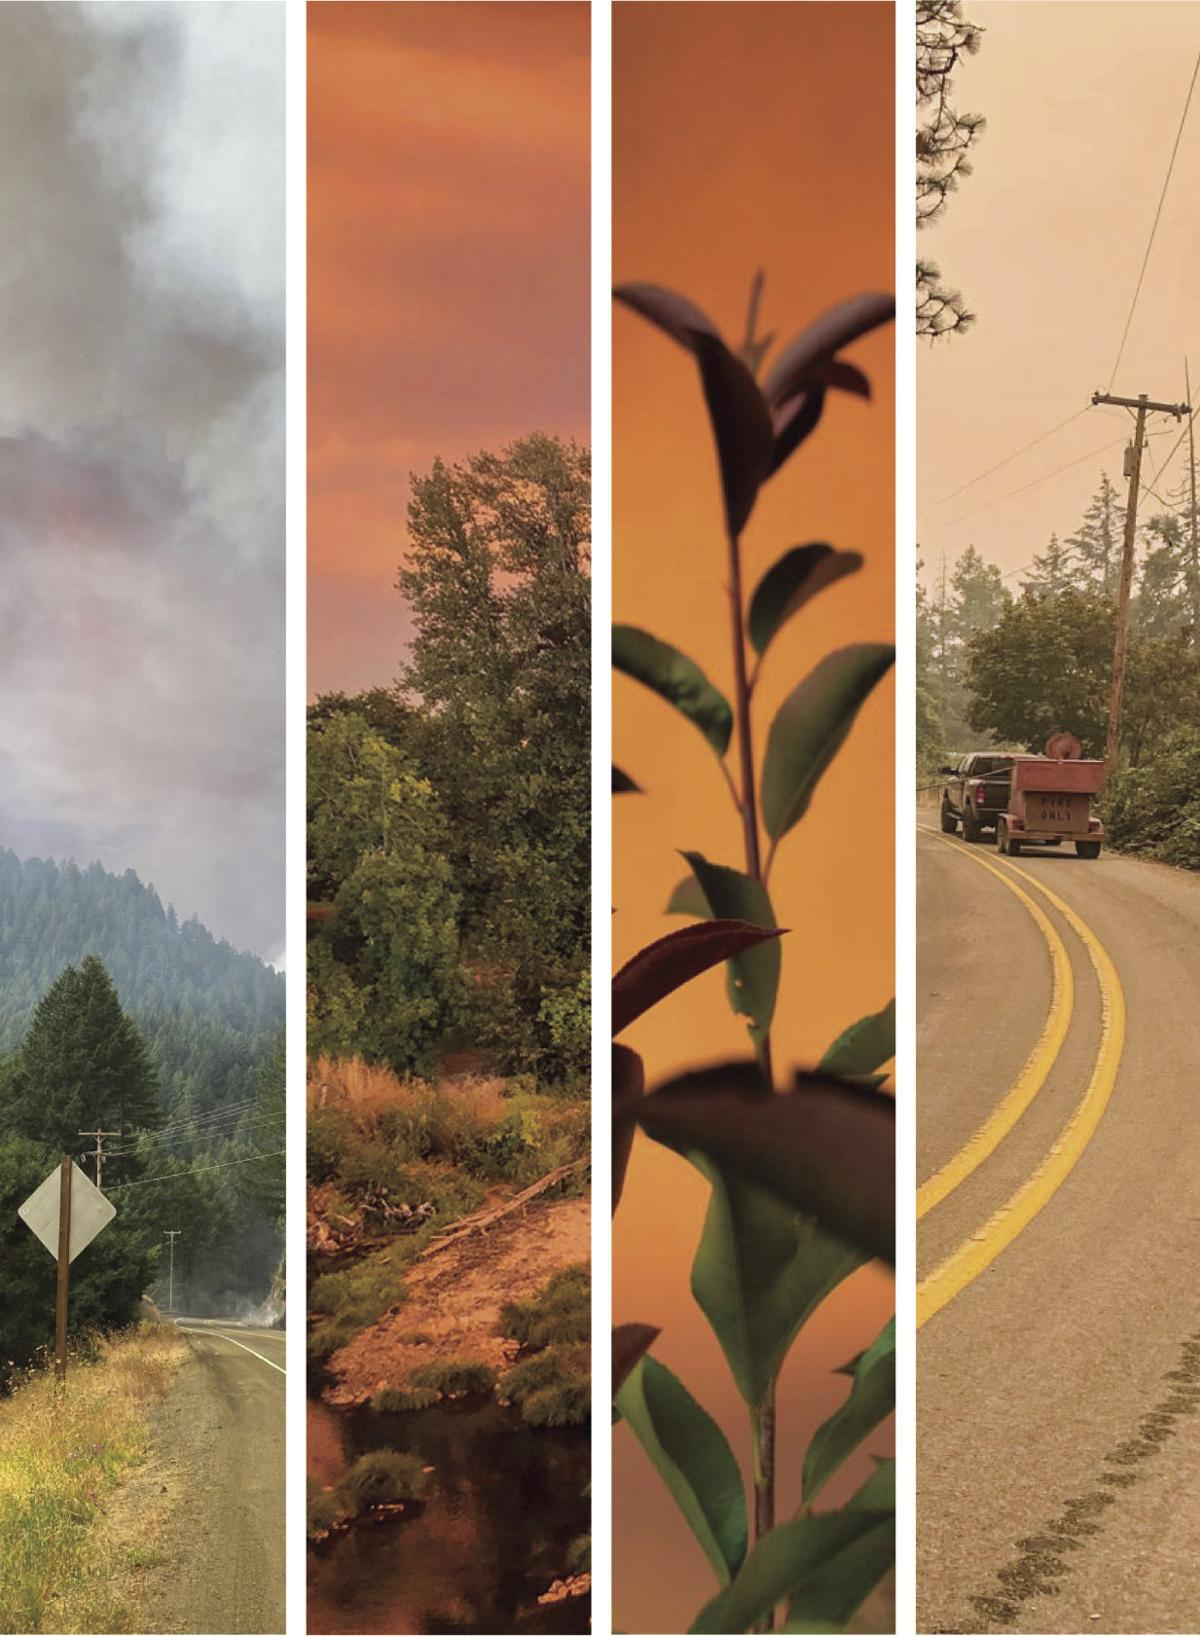 Wildfire causes main art